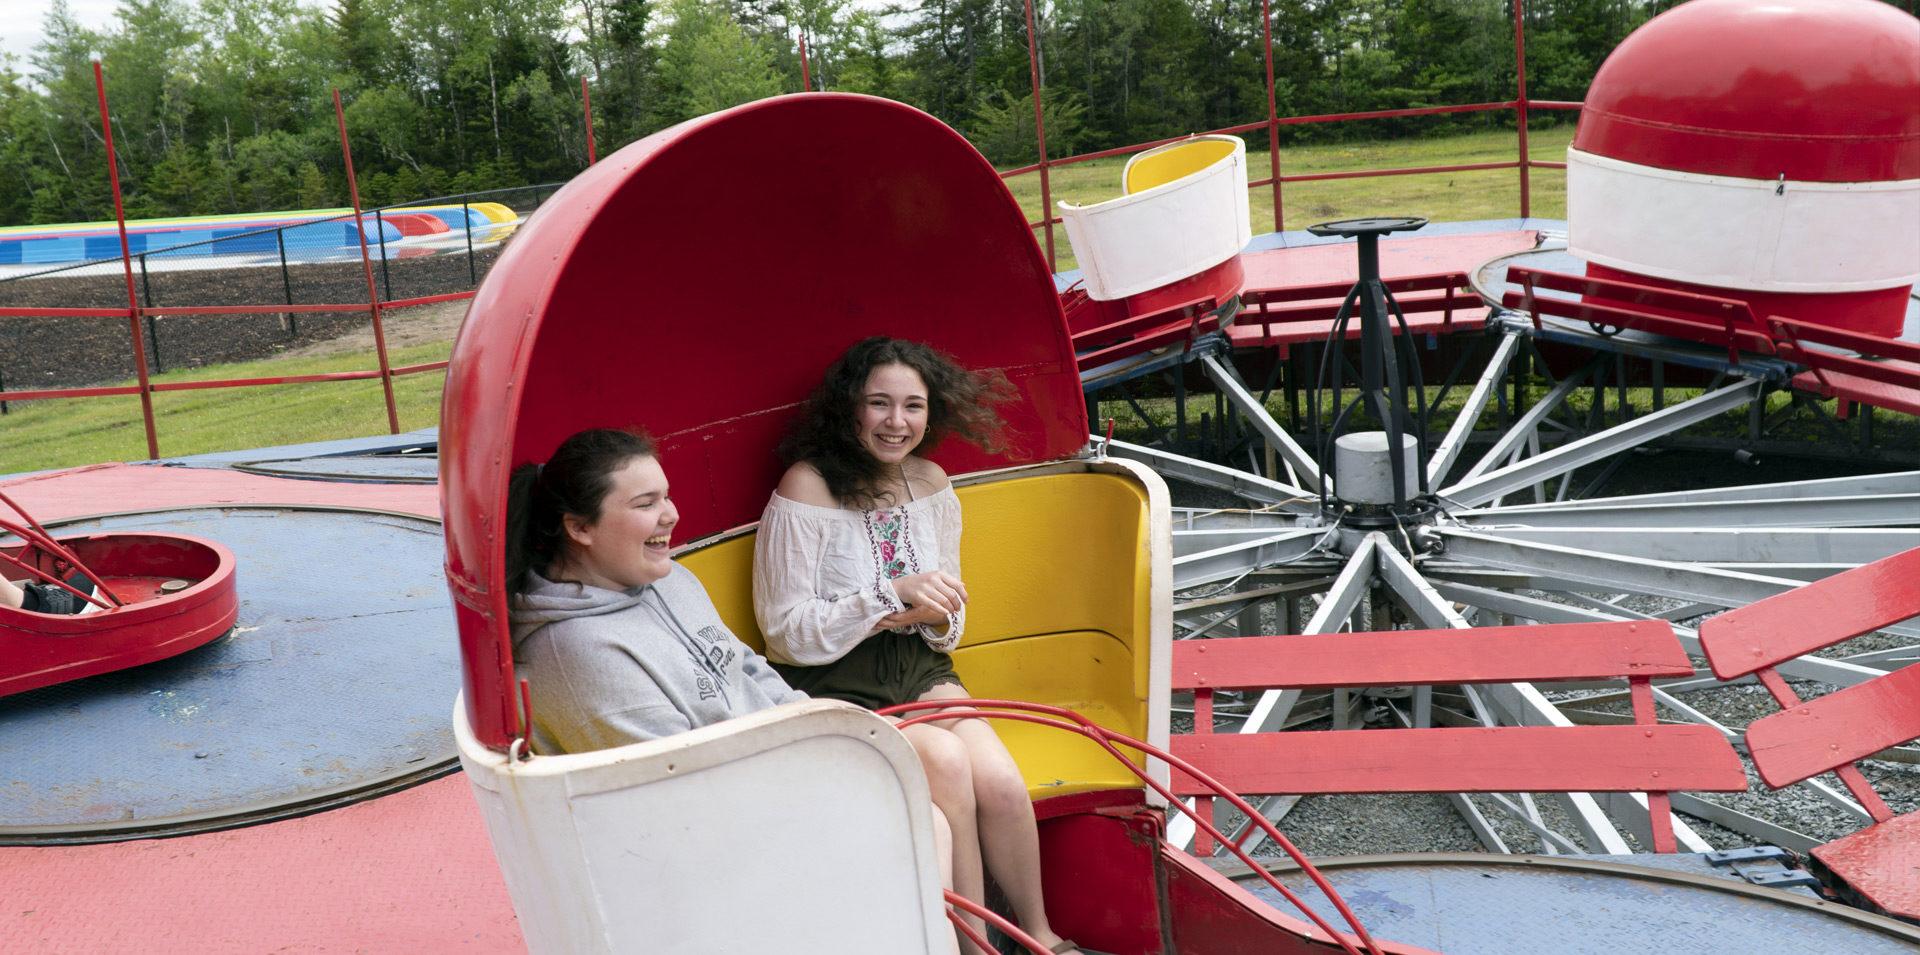 Fun rides